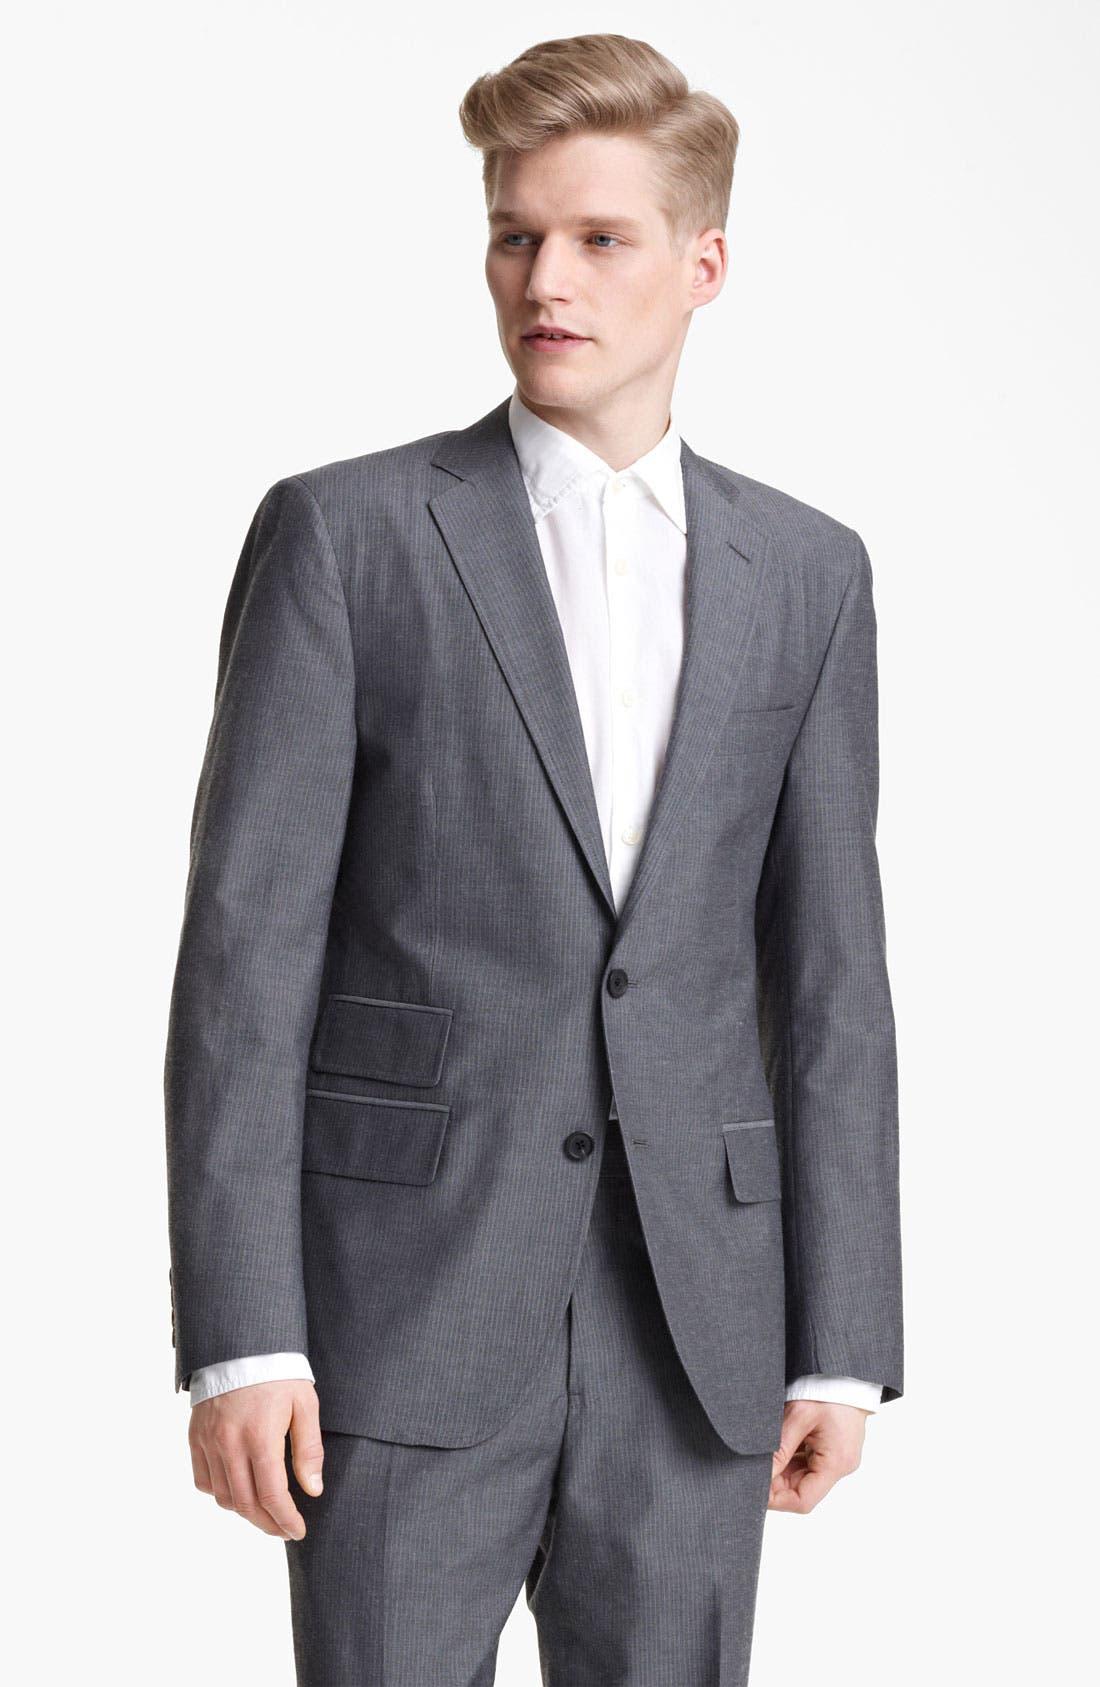 Main Image - Billy Reid 'Campbell' Grey Stripe Suit